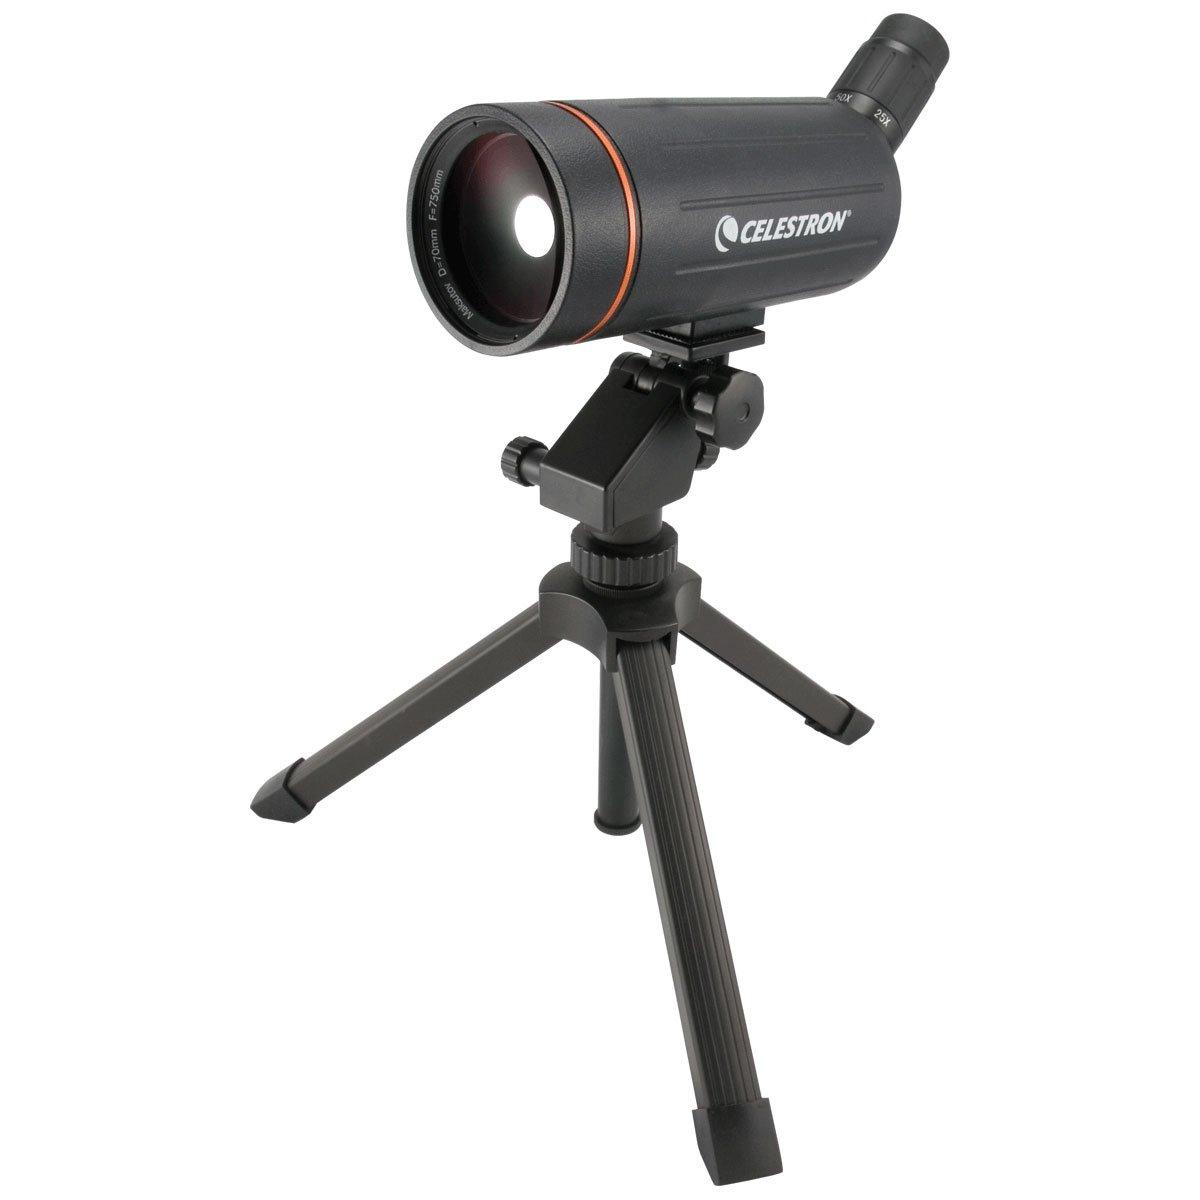 Celestron C70 Mini Mak Telescope /// Great spotting scope - £79 / £86.50 delivered @ Rother Valley Optics LTD